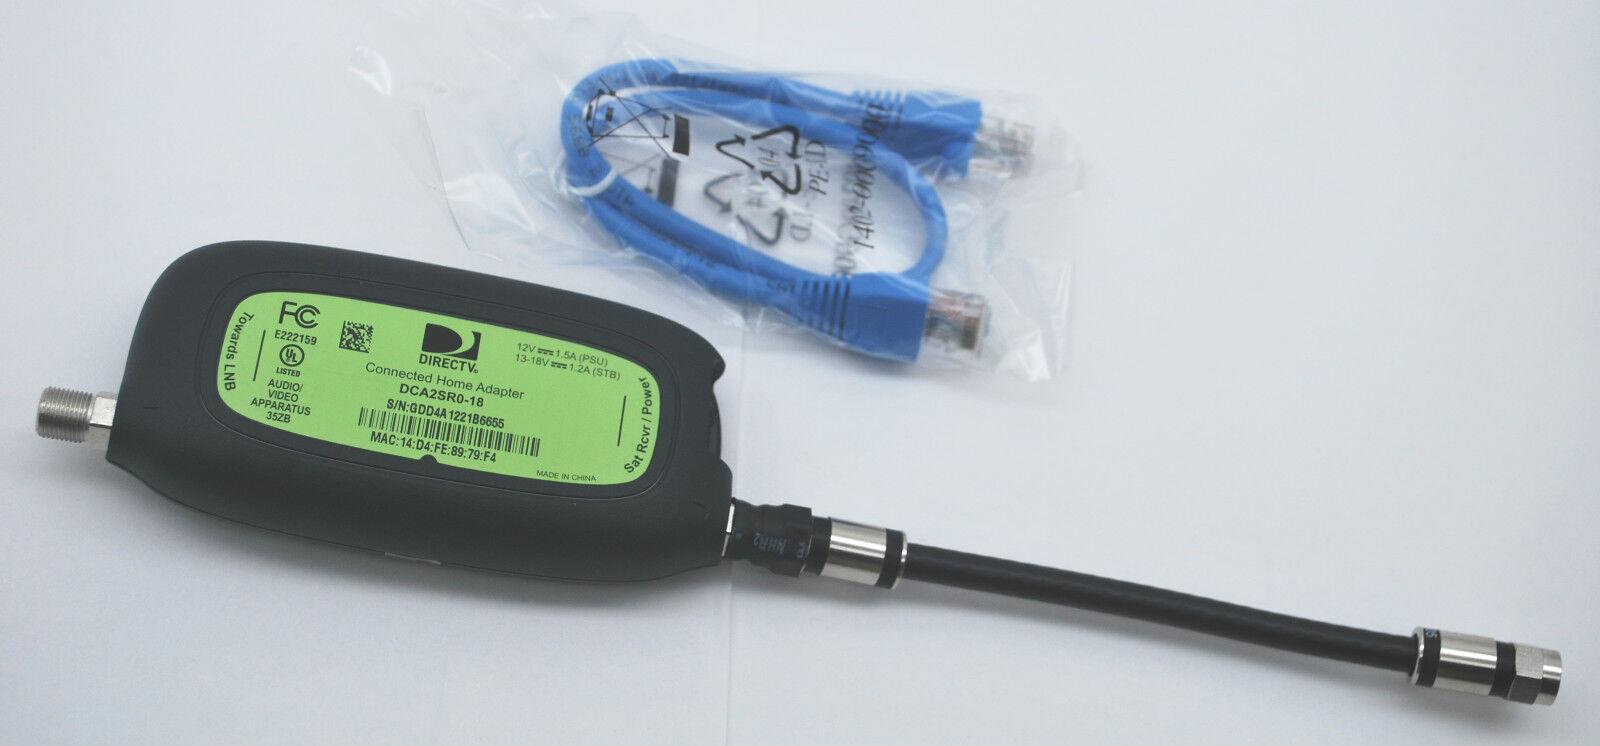 Directv Dca2sr0-18 Deca Ii Ethernet To Coax Home Adapter Multiroom Viewing Mrv